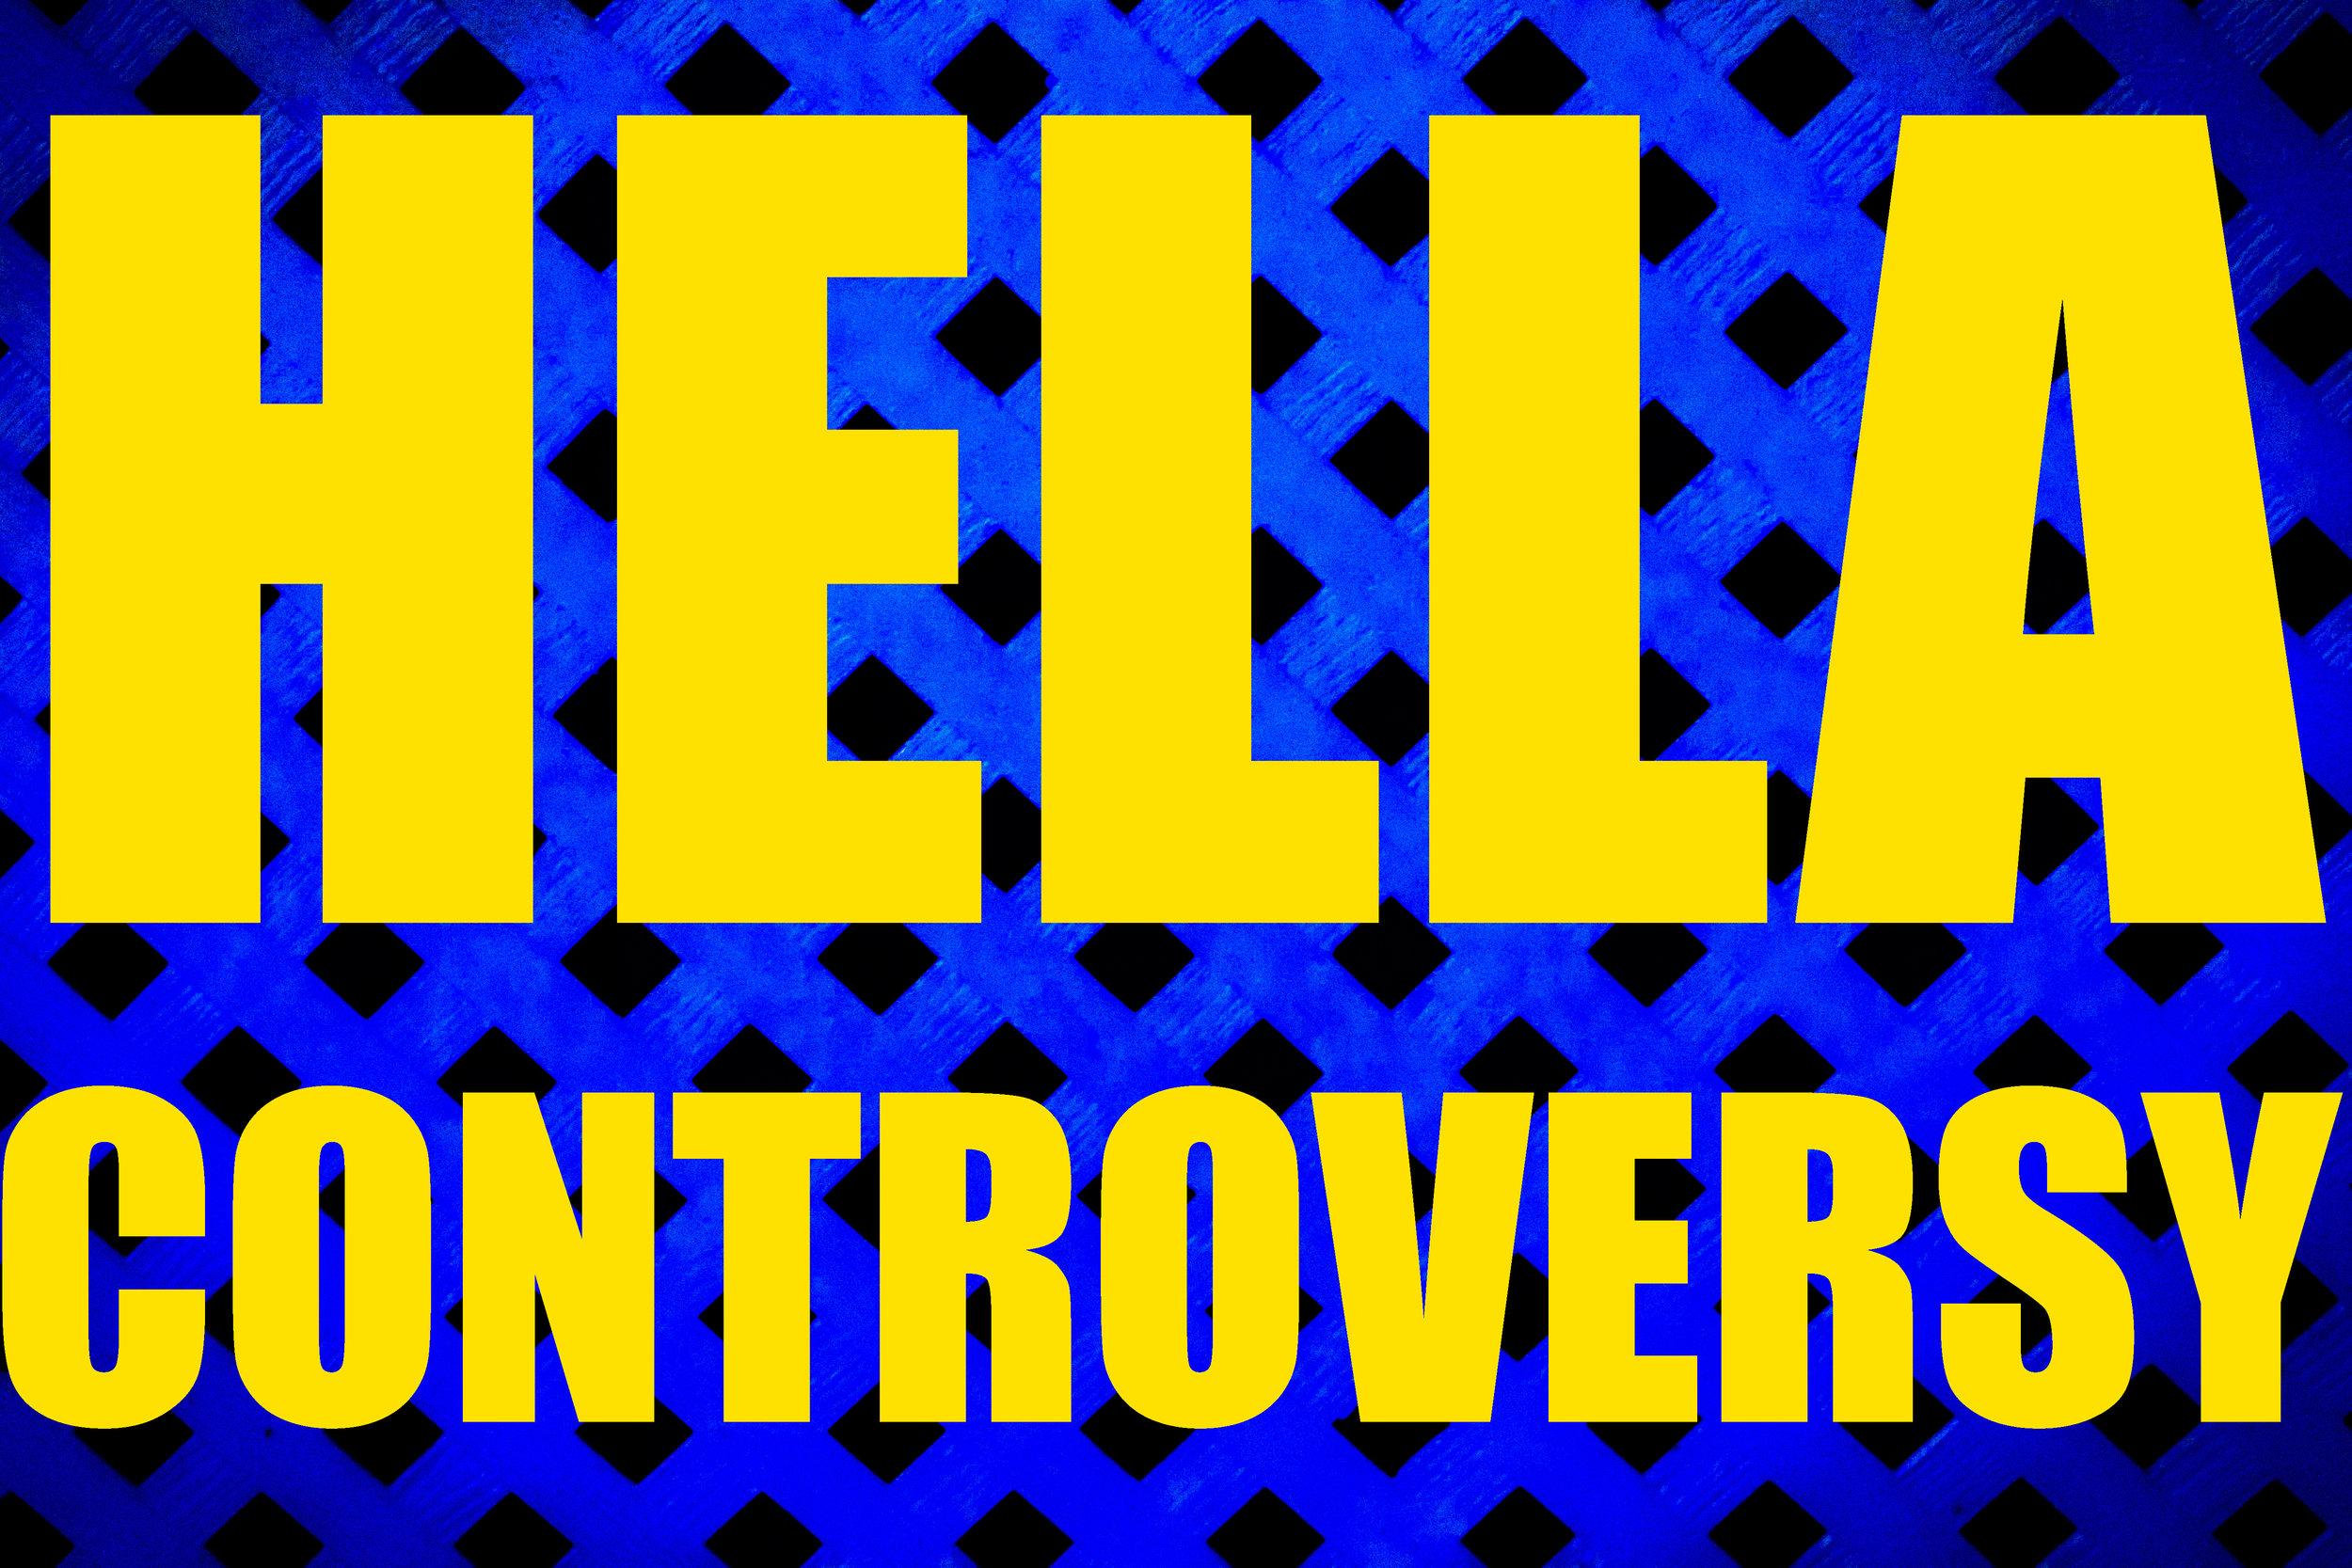 HellaControversy2.jpg